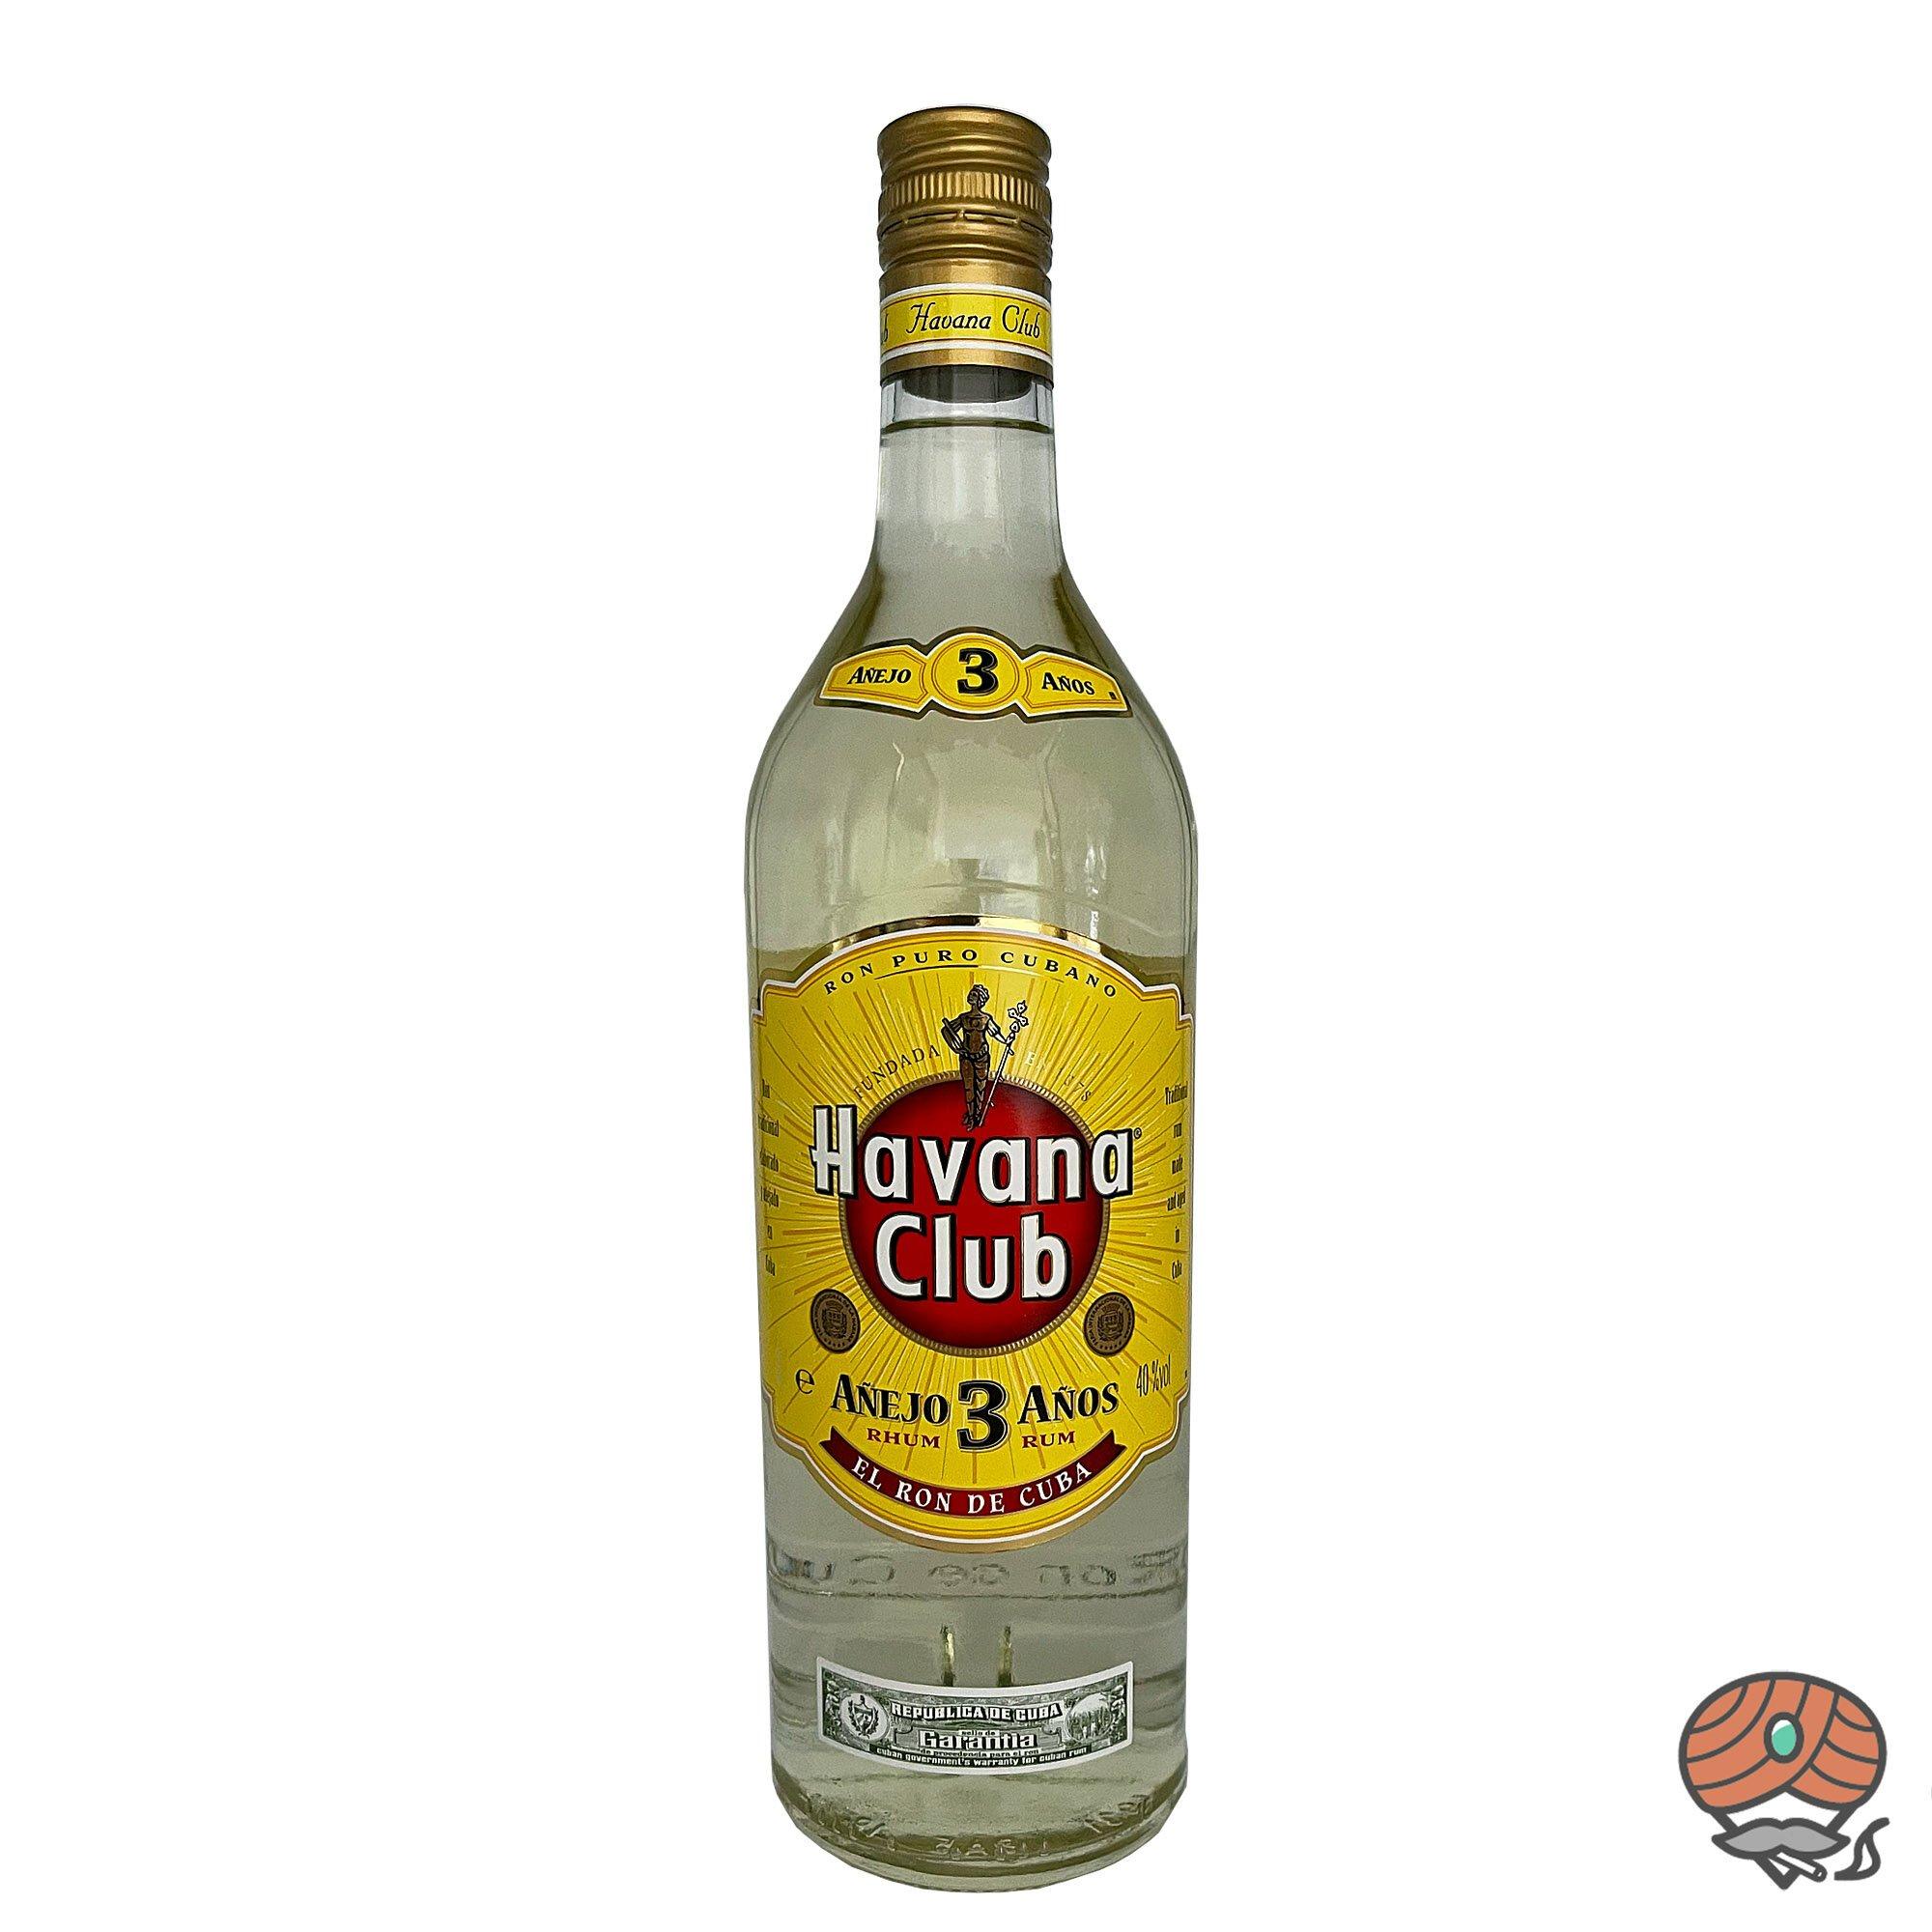 Havana Club 3 Años  Rum 1l, alc. 40 Vol.-%